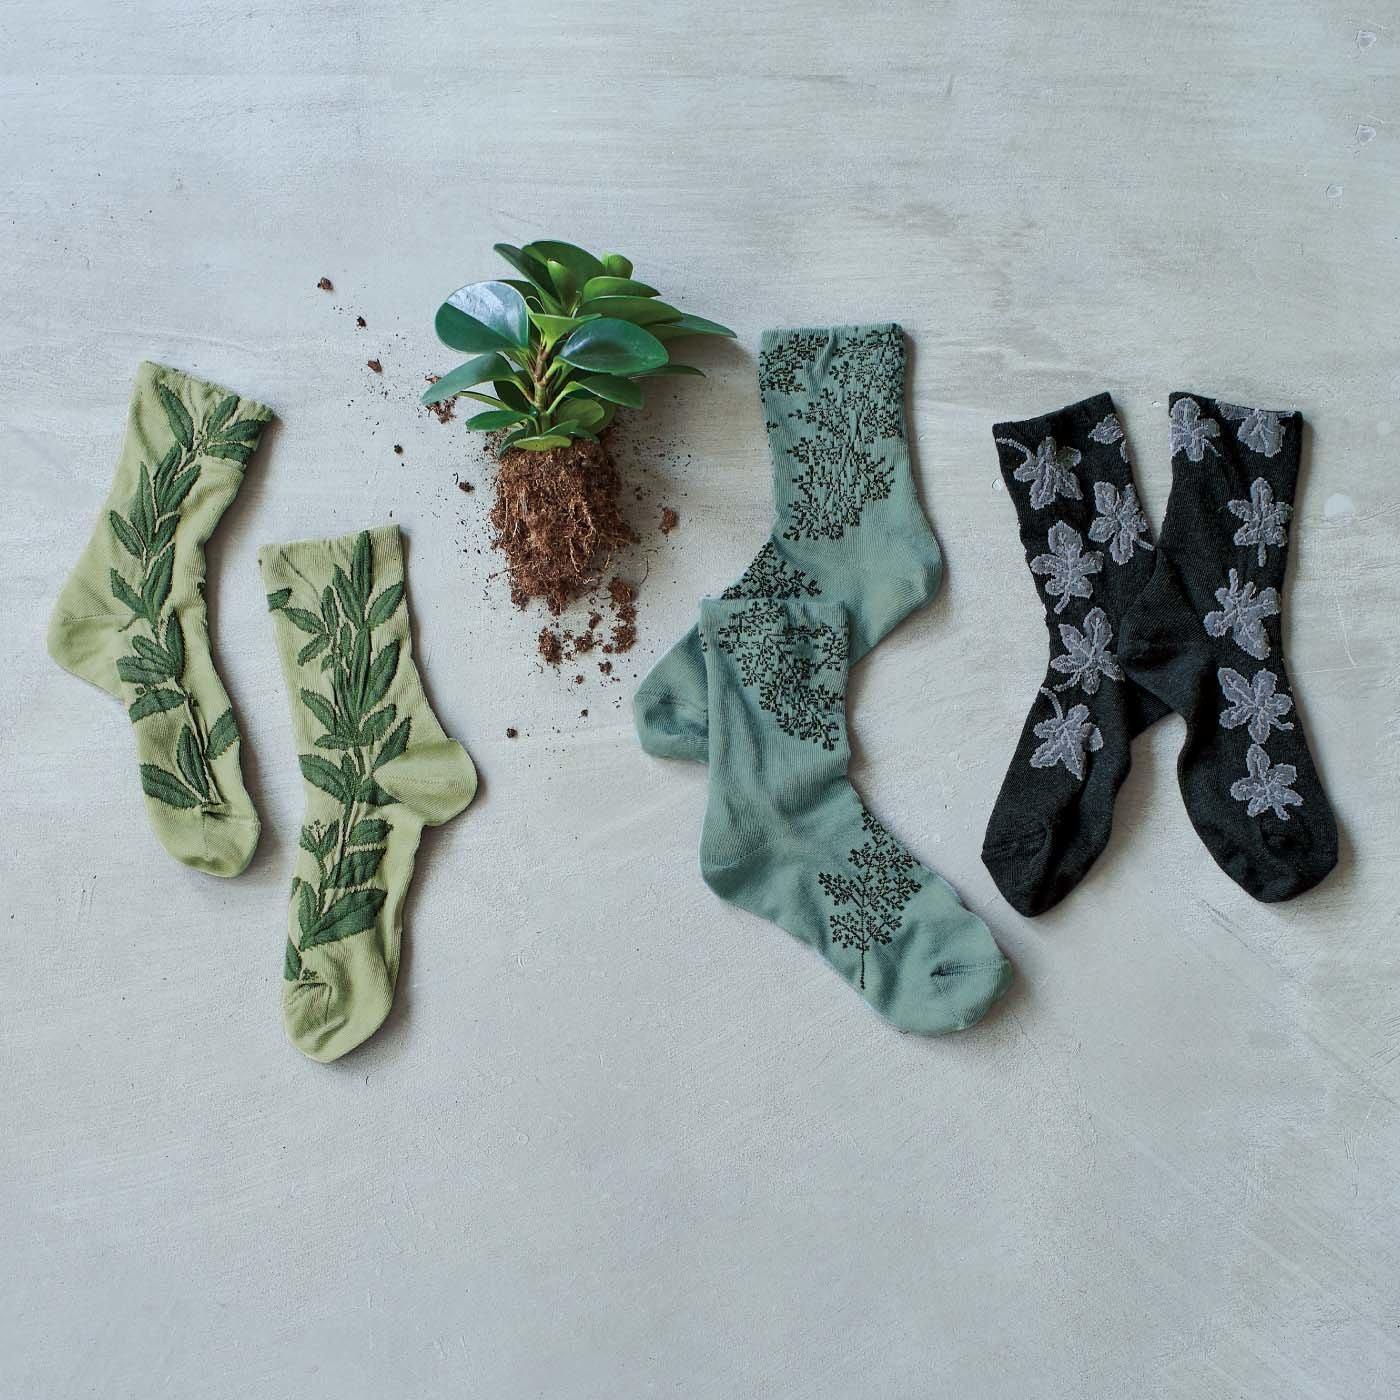 el:ment×Yuko Yamamoto 植物モチーフがゆったり紡ぐ 肌側上質シルクが心地よい薄手二重編み靴下の会